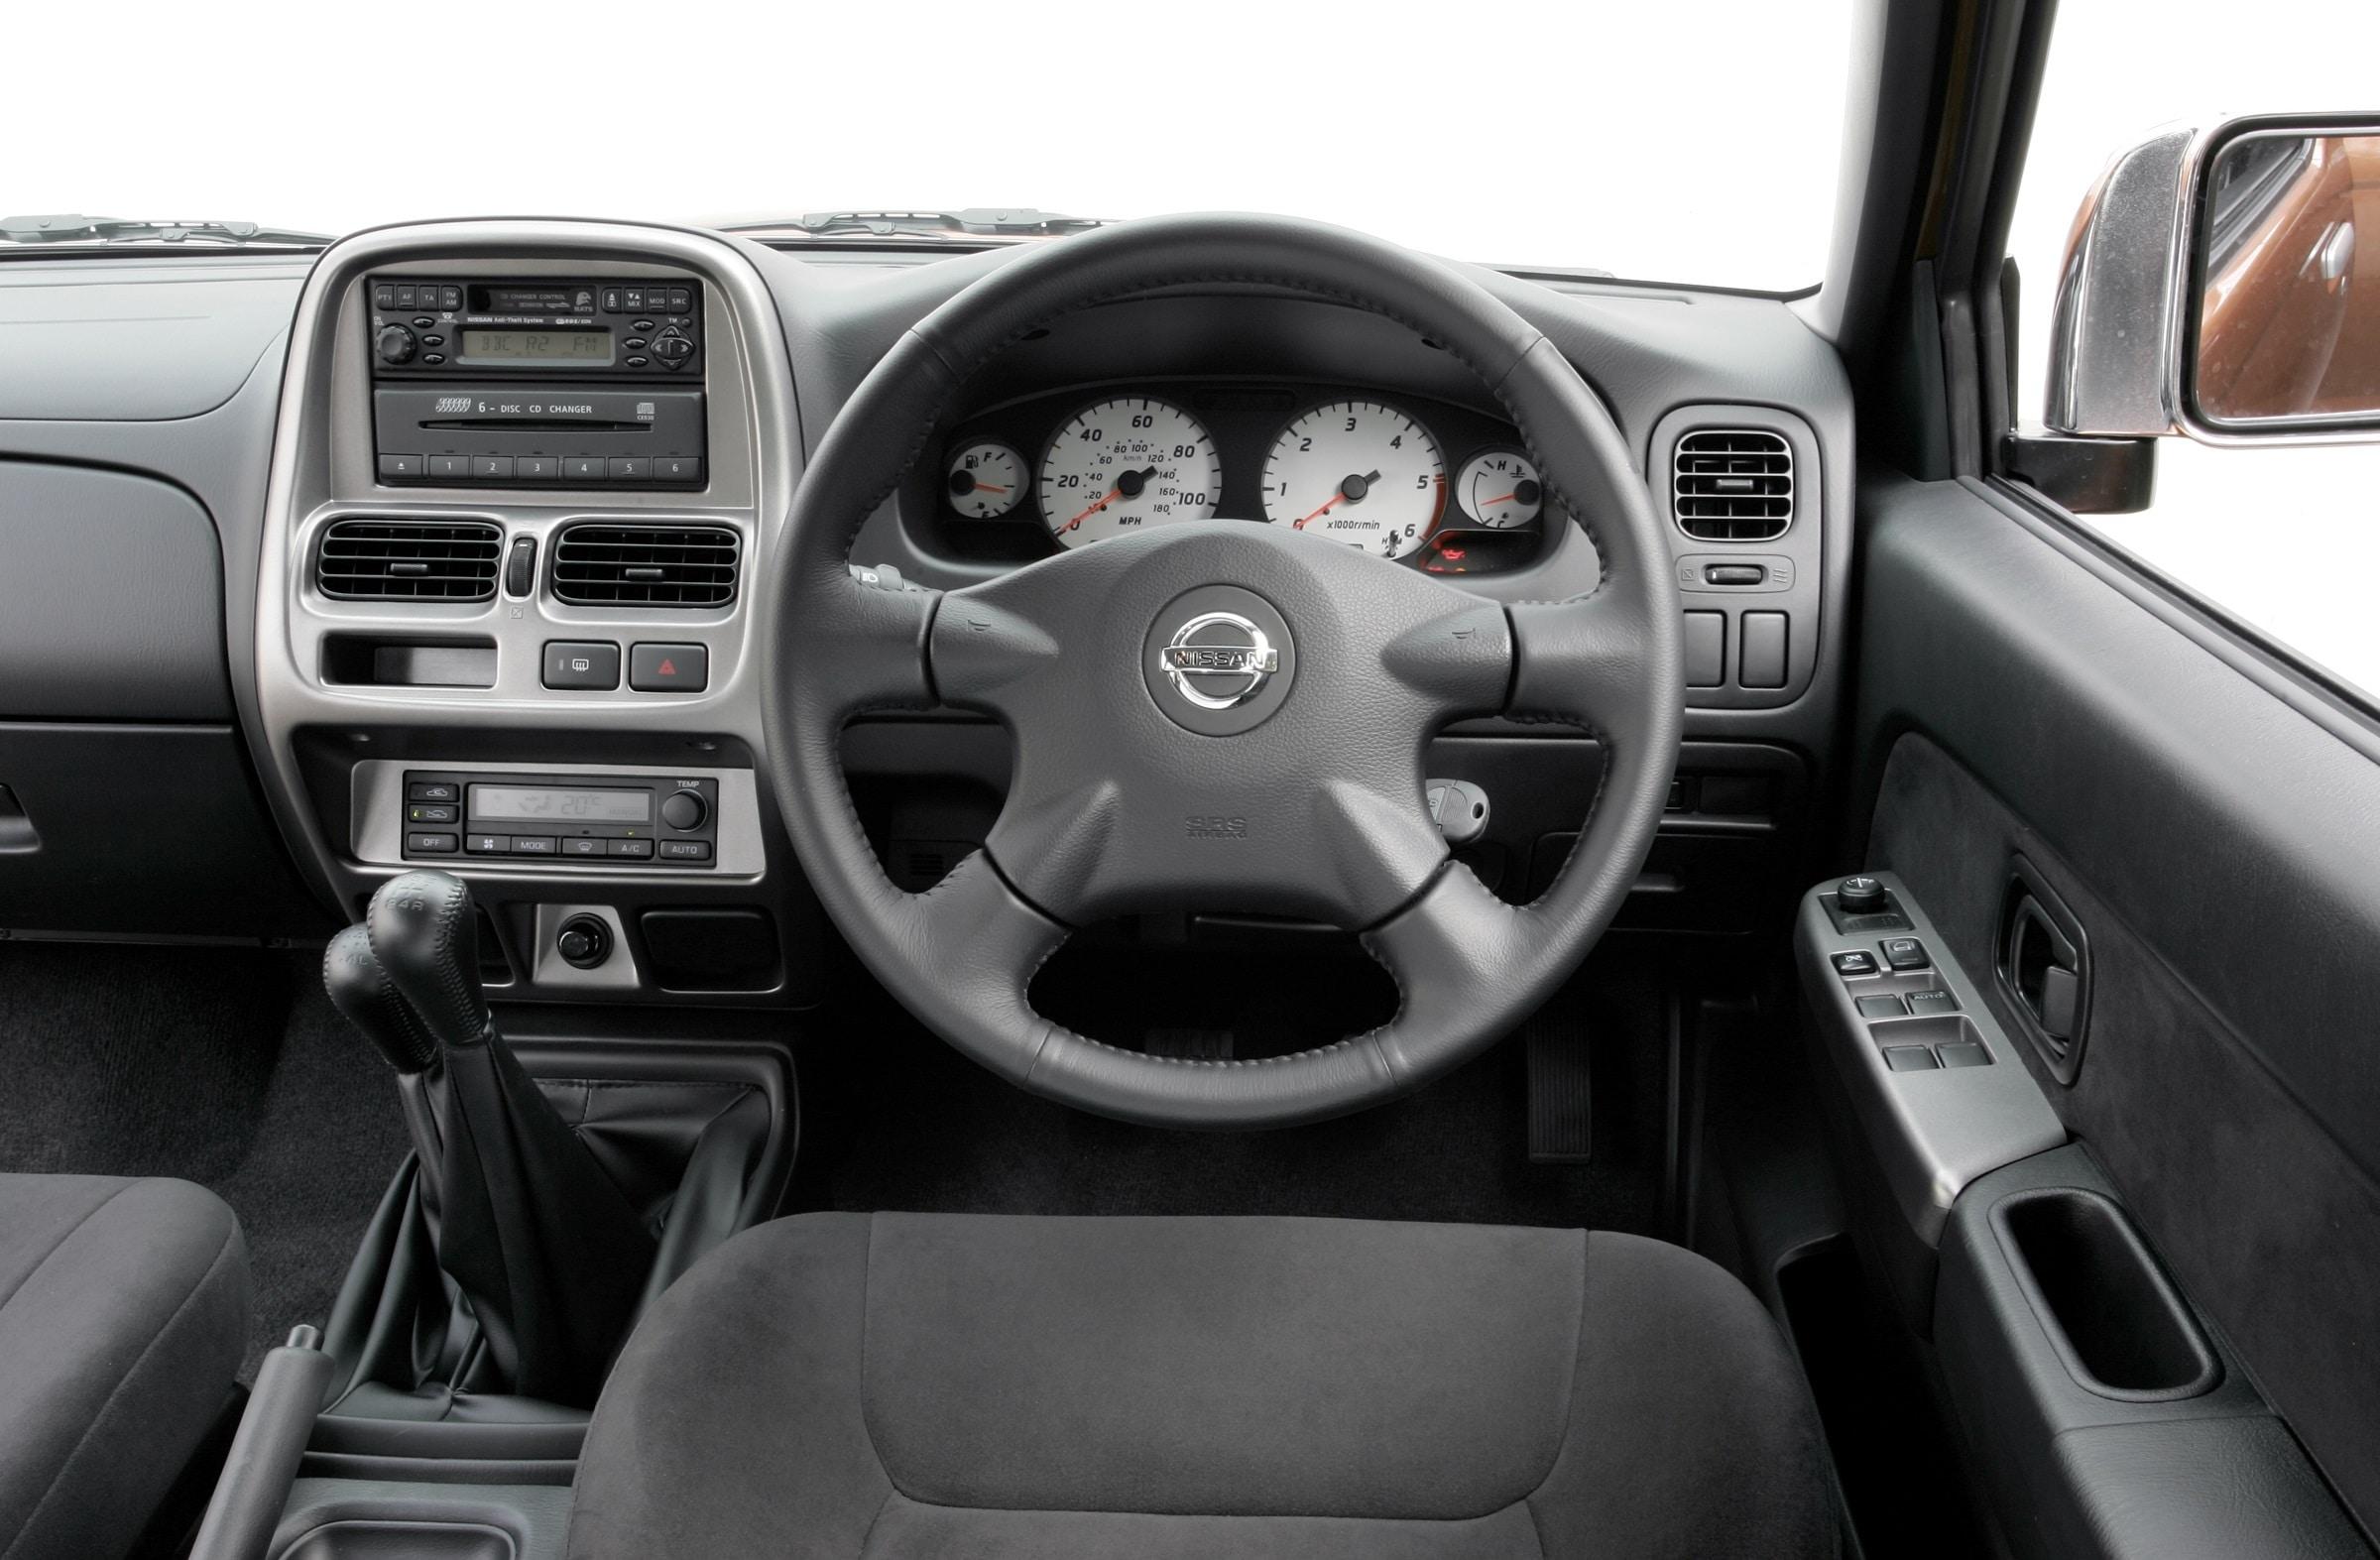 Nissan Navara D22, Nissan Navara, Nissan, Navara, Navara D22, Nissan D22, Pick-up, pick-up truck, 4x4, off-road, off road, truck, builder, commercial, motoring, automotive, car, cars, motoring, automotive, retro car, classic car, practical car, off road car, ebay, ebay motors, autotrader